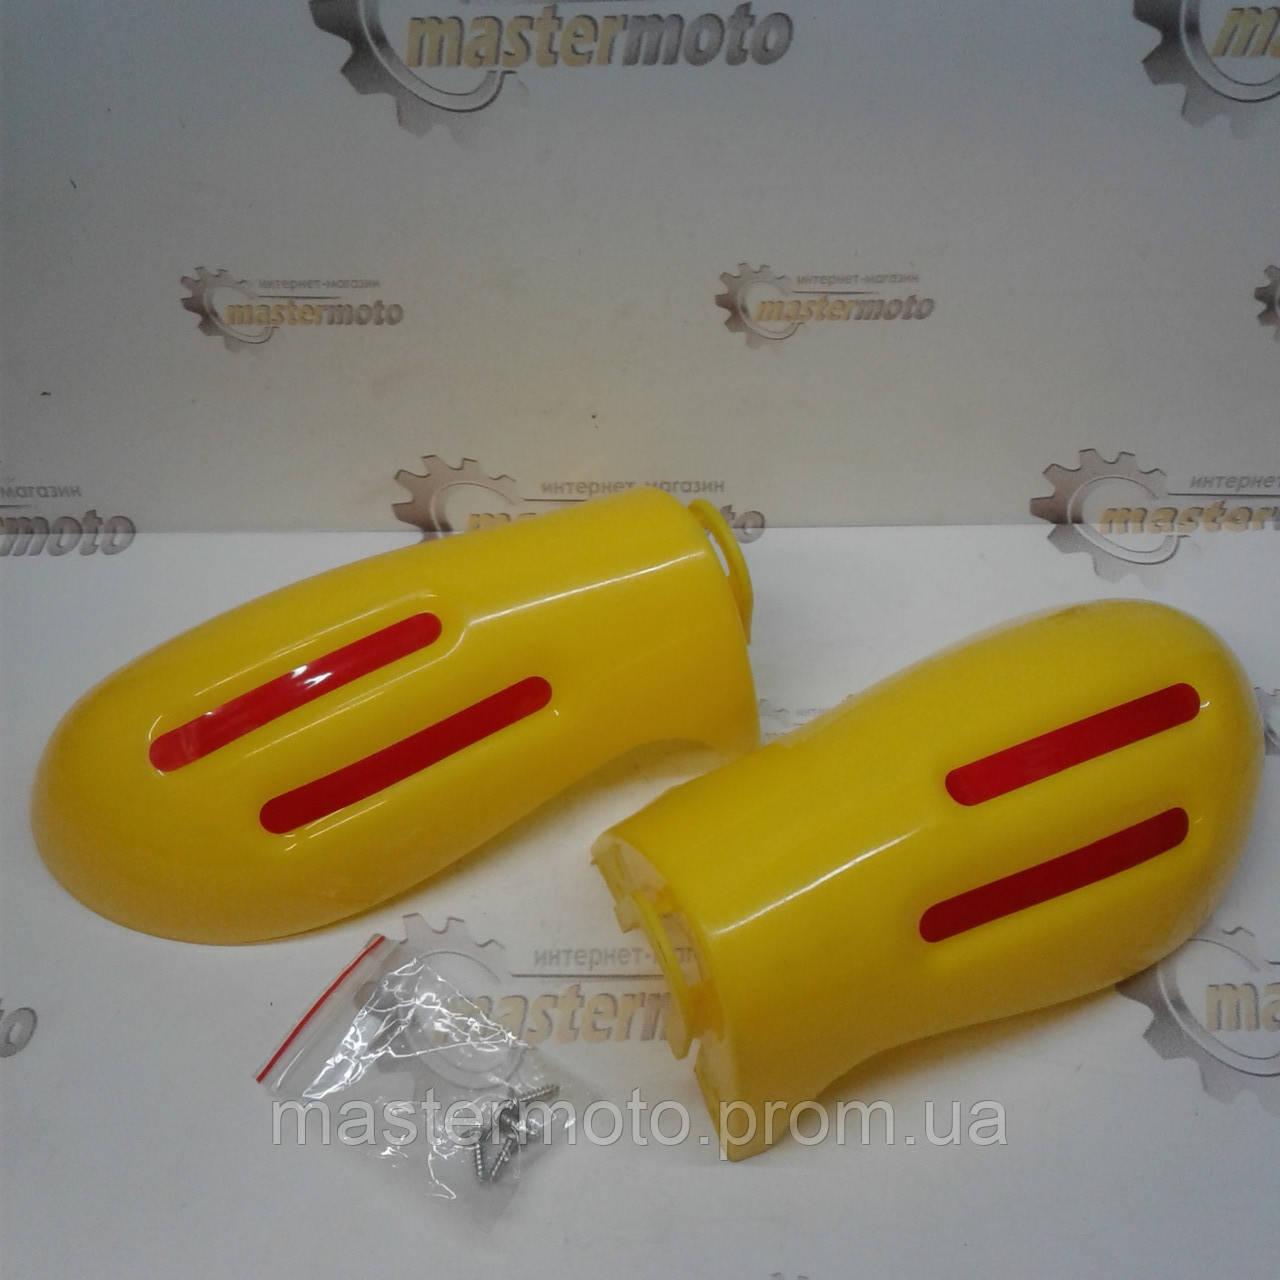 Захист рук на кермо, жовті, XJB